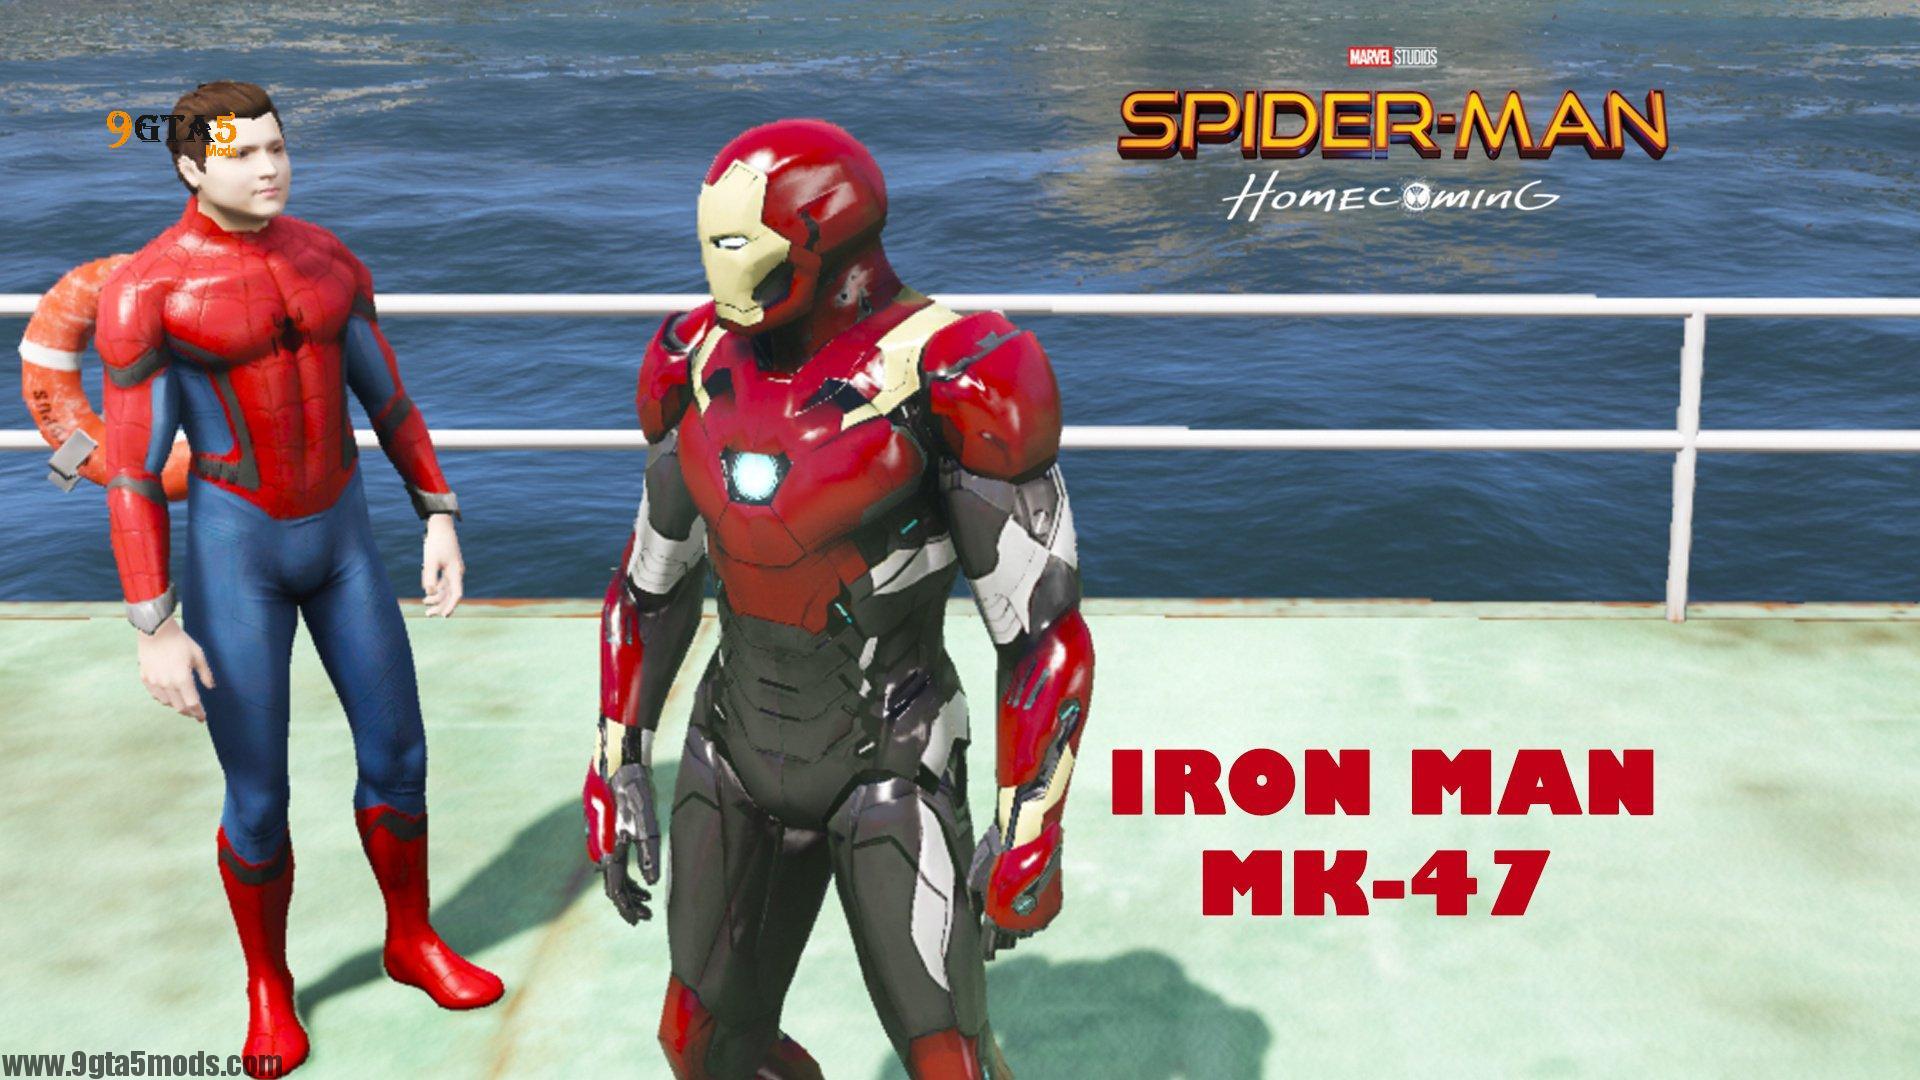 Iron Man Mark 47 Spider Man Homecoming - GTA 5 PLAYER Mods